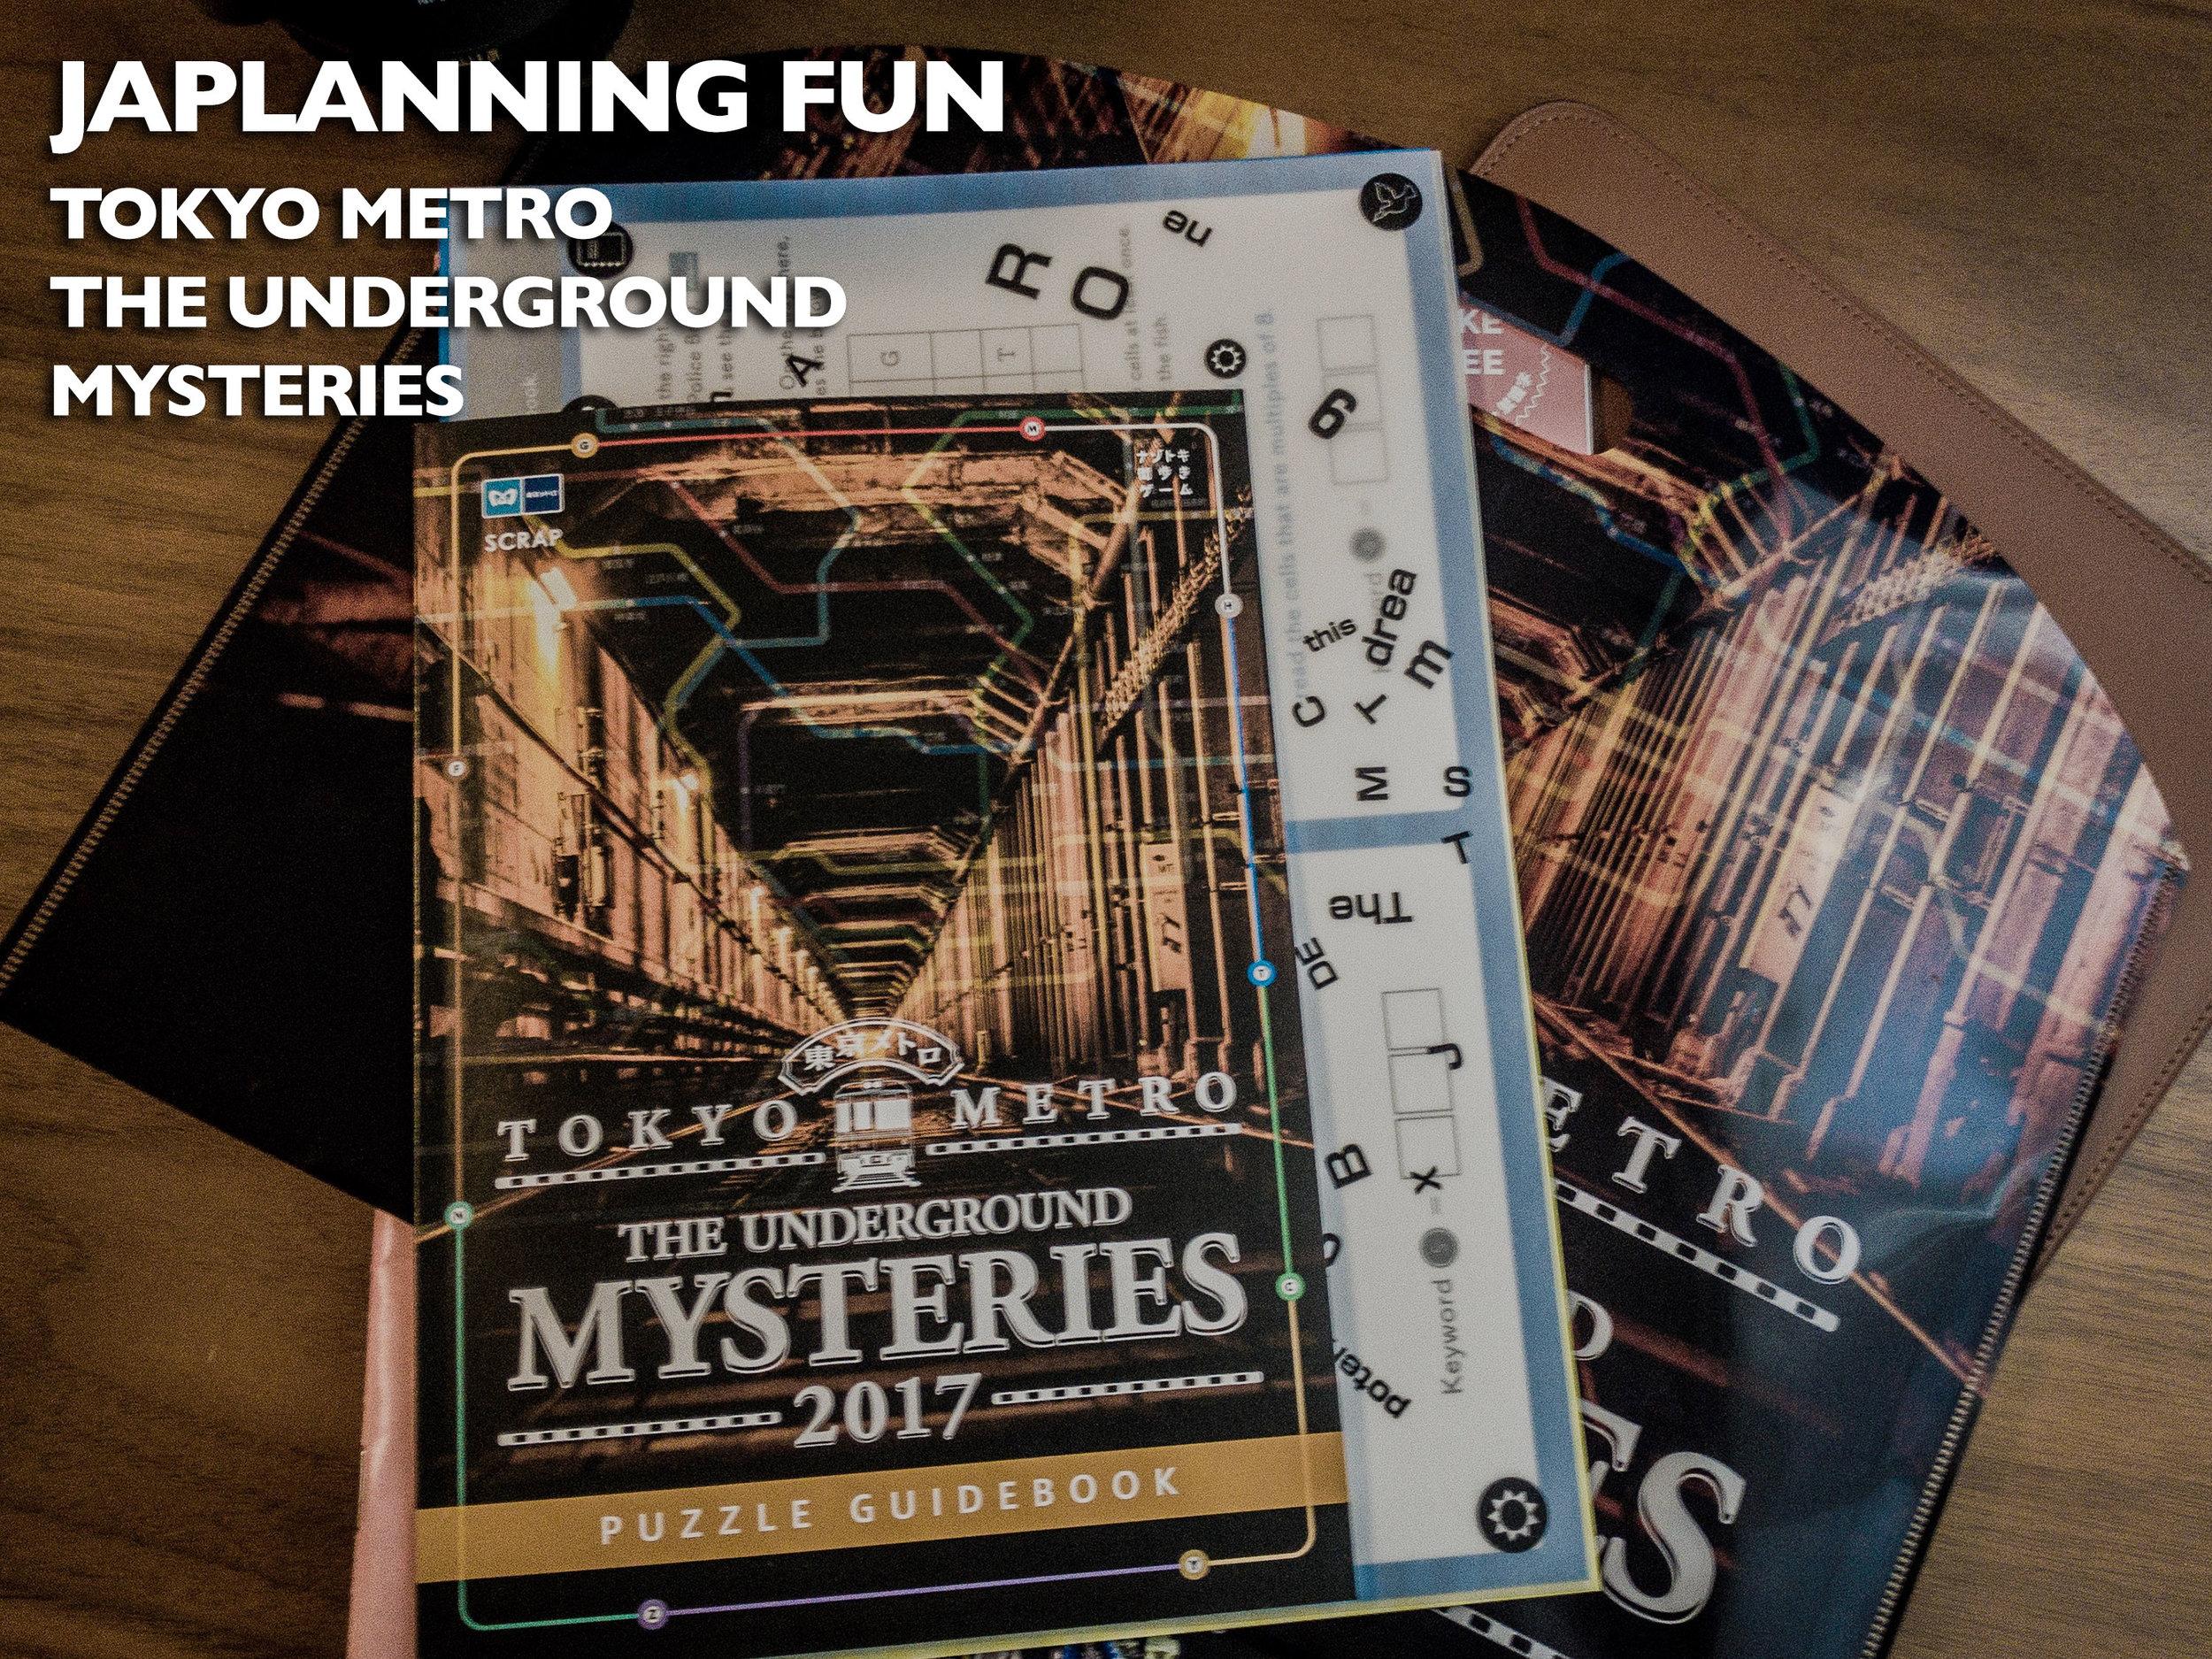 Tokyo Metro - The Underground Mysteries